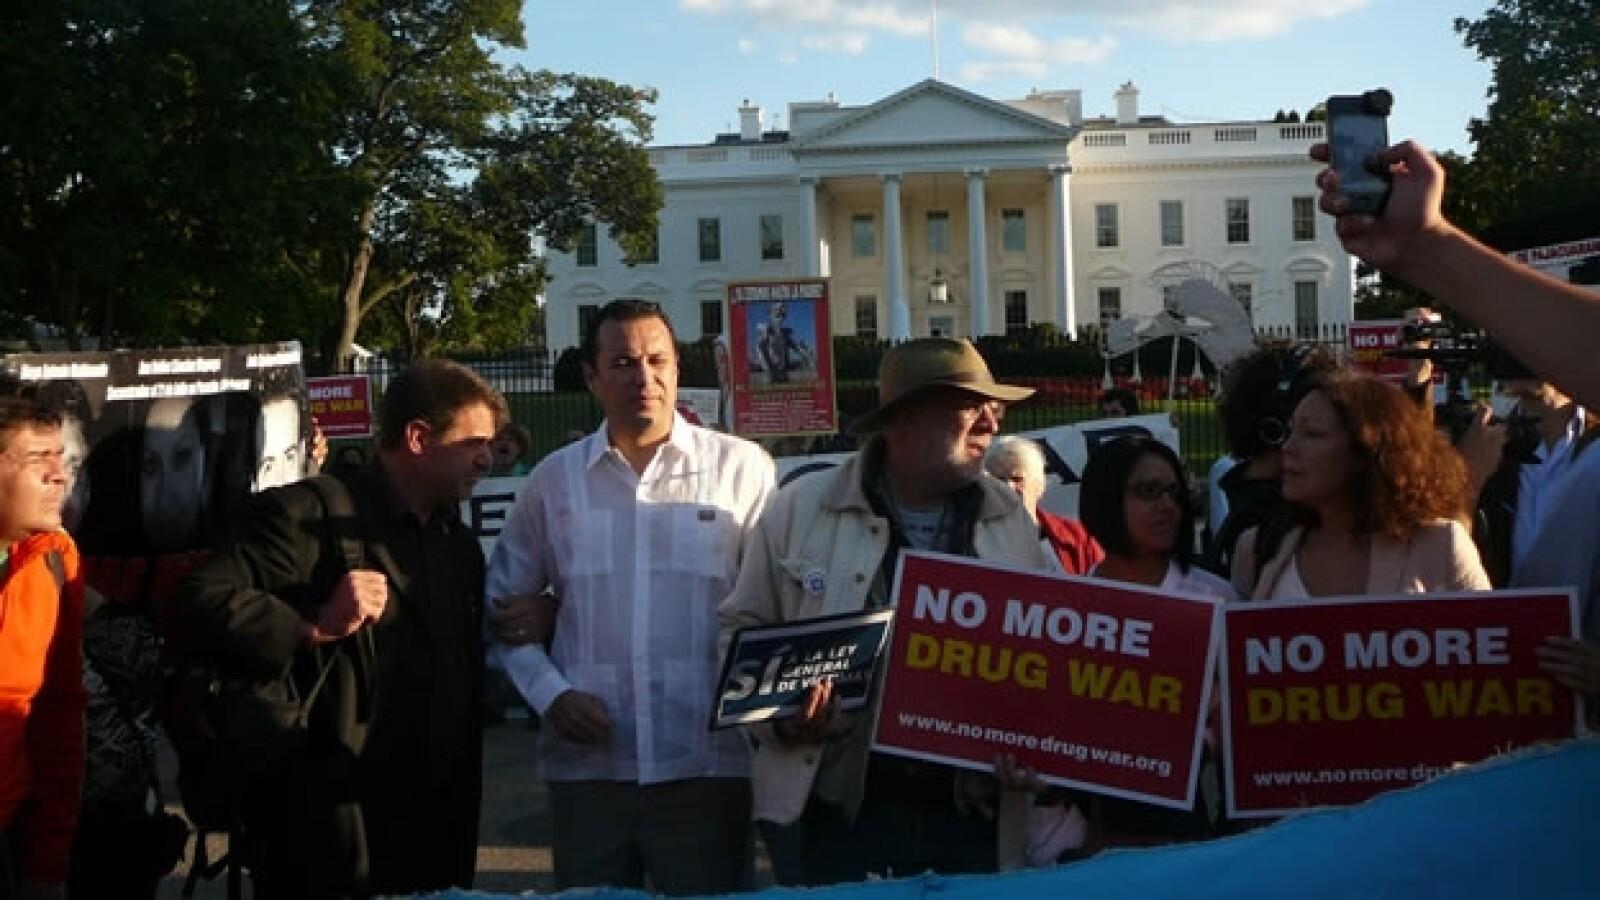 La caravana por la paz llega a Washington